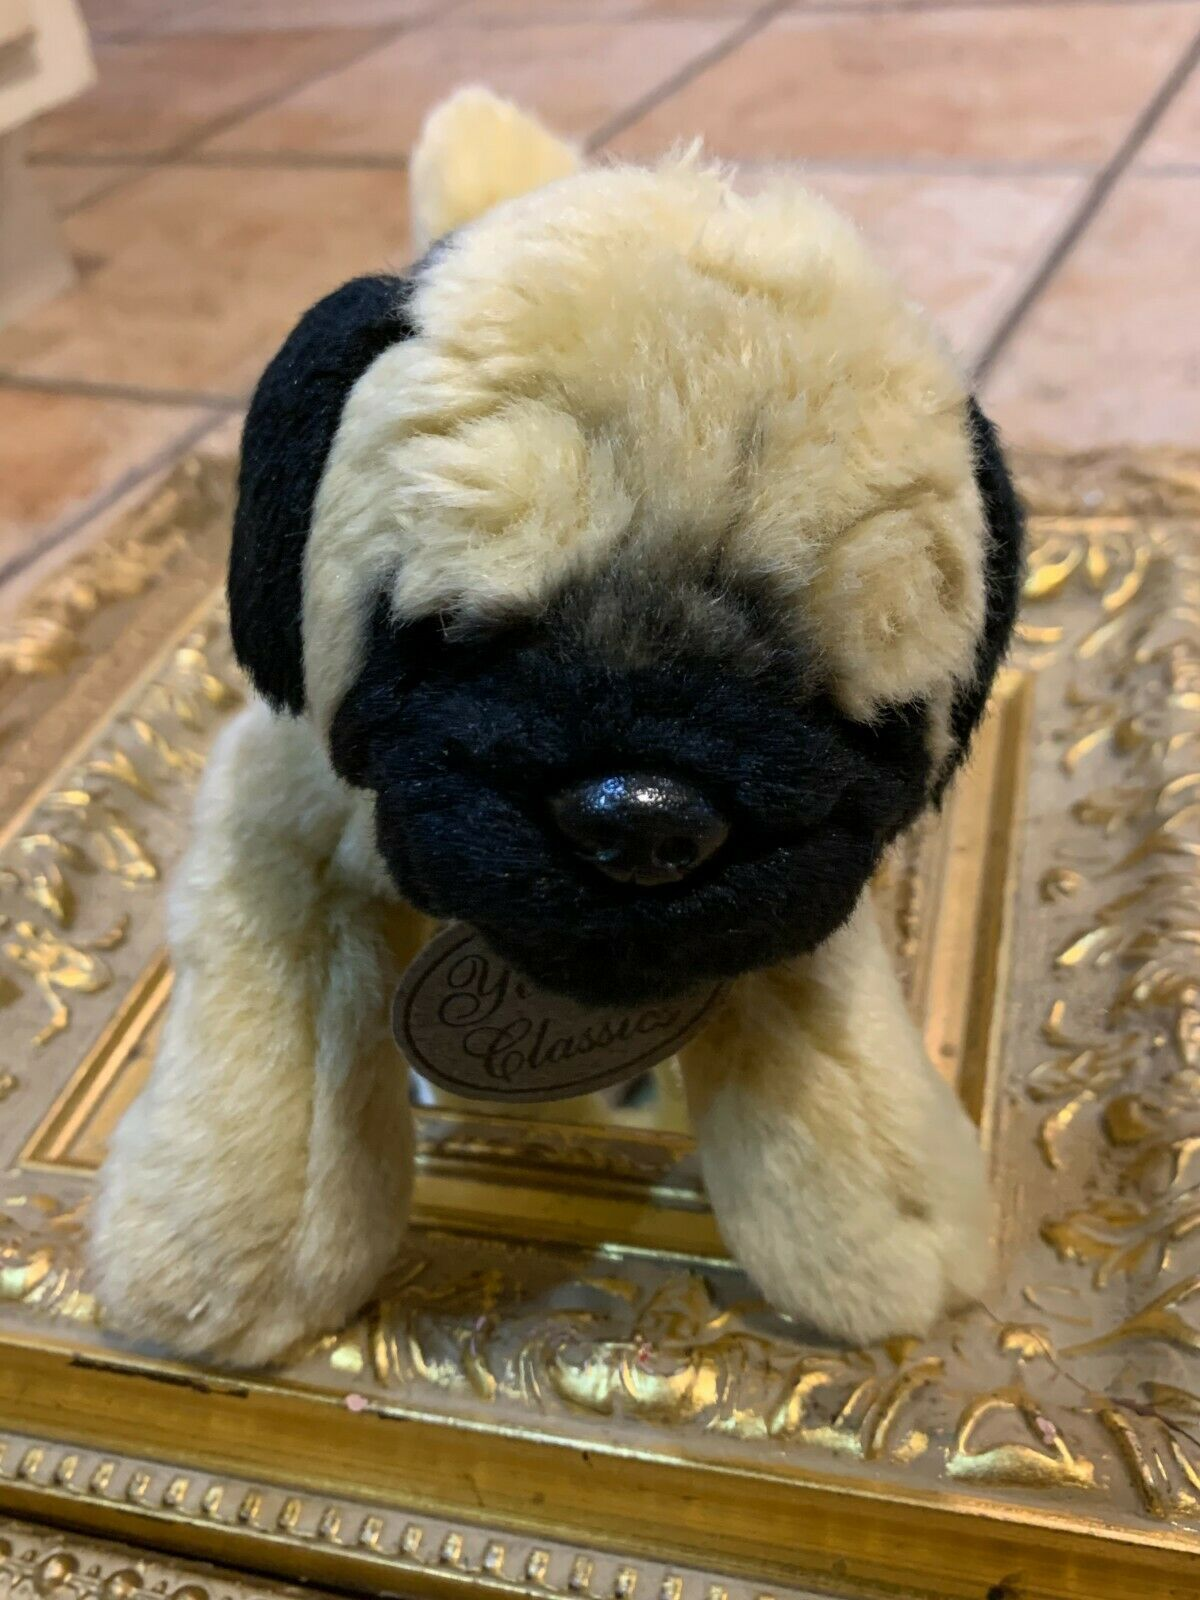 "YOMIKO CLASSIC RUSS BERRIE TAN BLACK PUG DOG 10""  STUFFED ANIMAL NEW 25371 - $17.99"